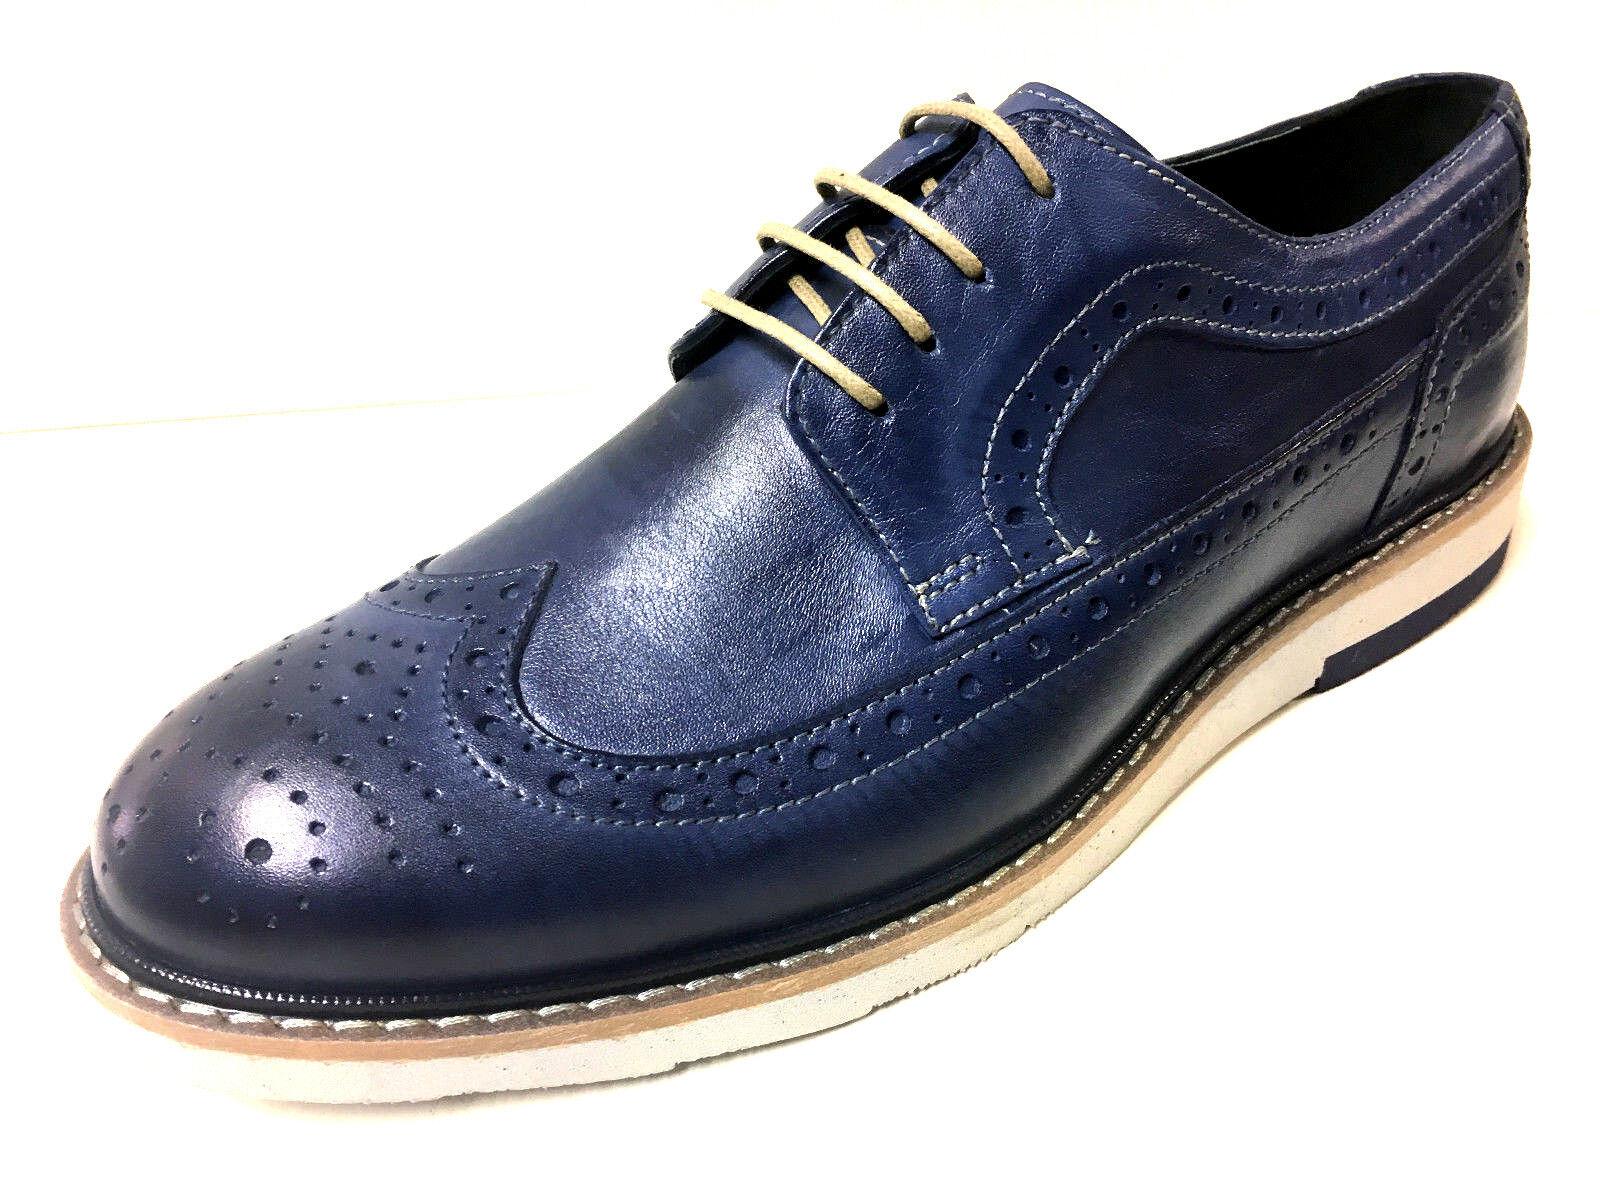 Nueva moda azul Alessandrini mocasín azul cuero Budapester caballero zapatos con cordones 42